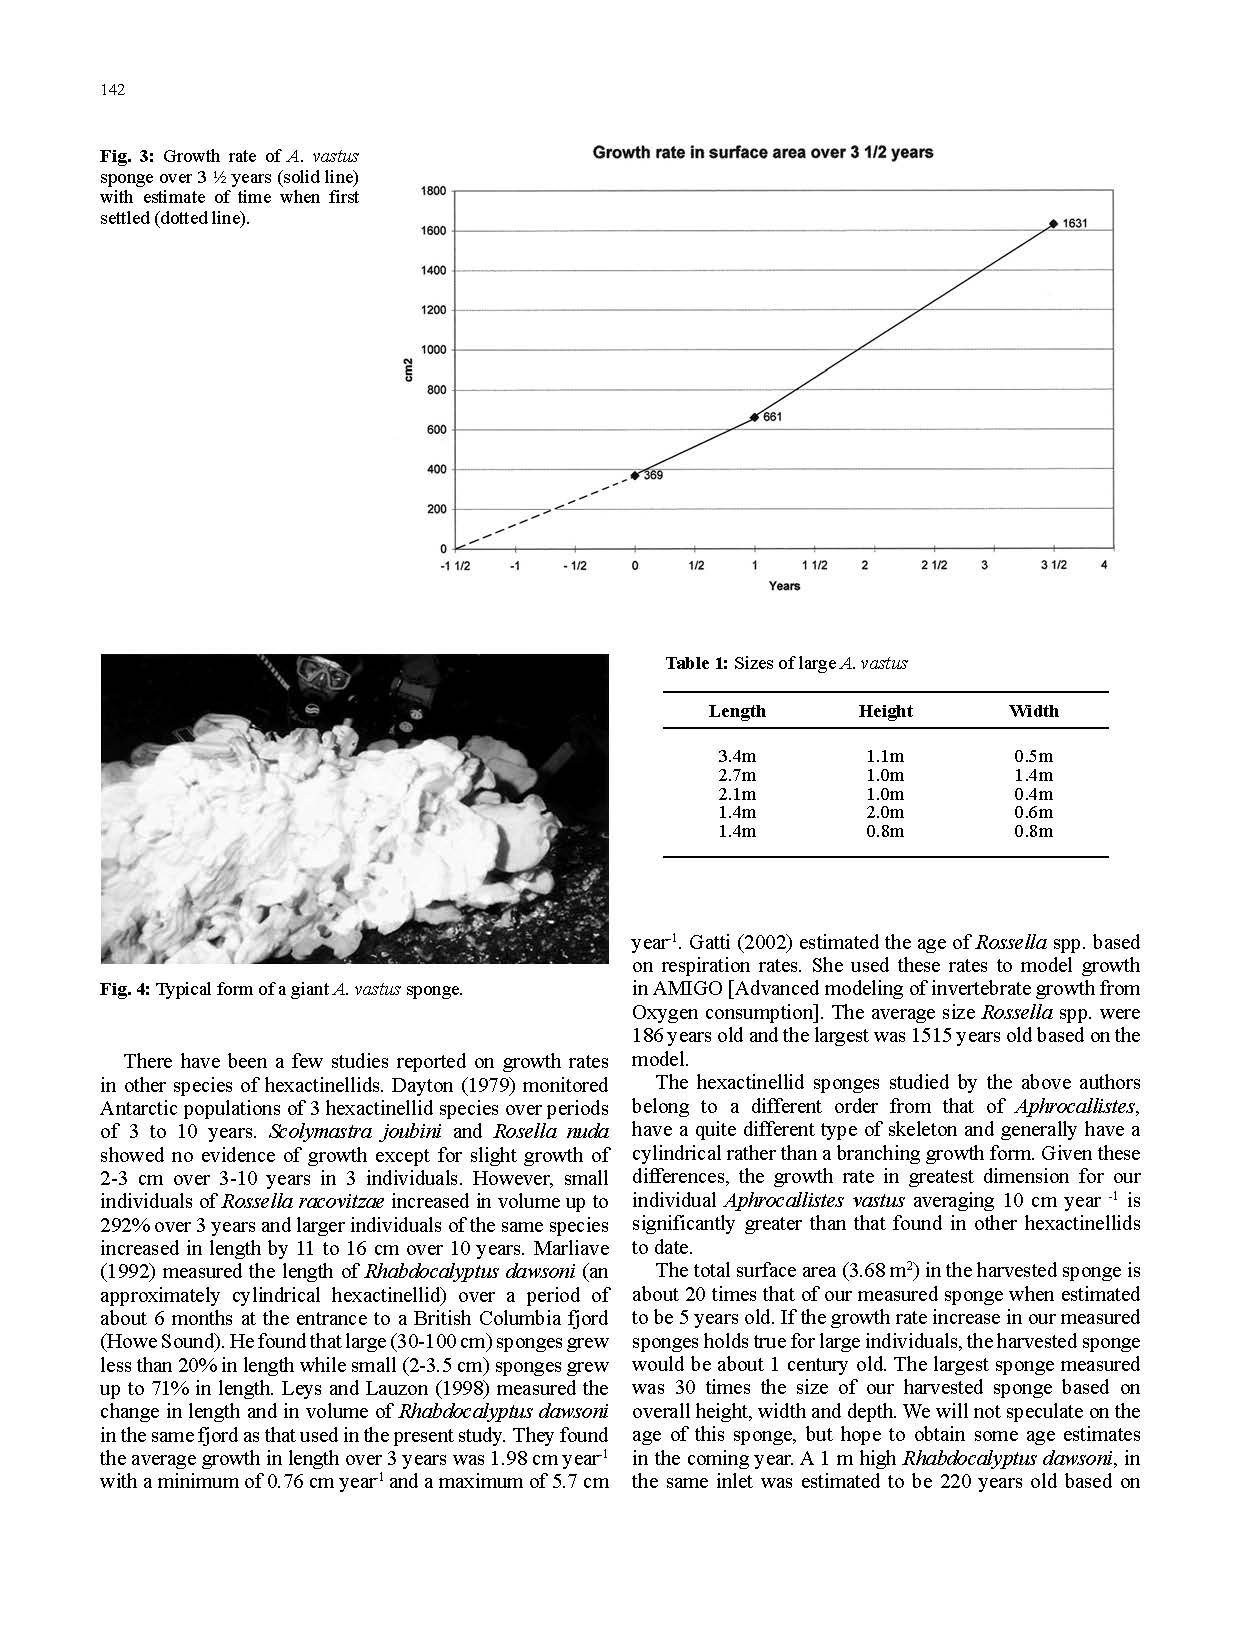 Austin et al - Growth and morphology of Aphrocallistes vastus_Page_4.jpg